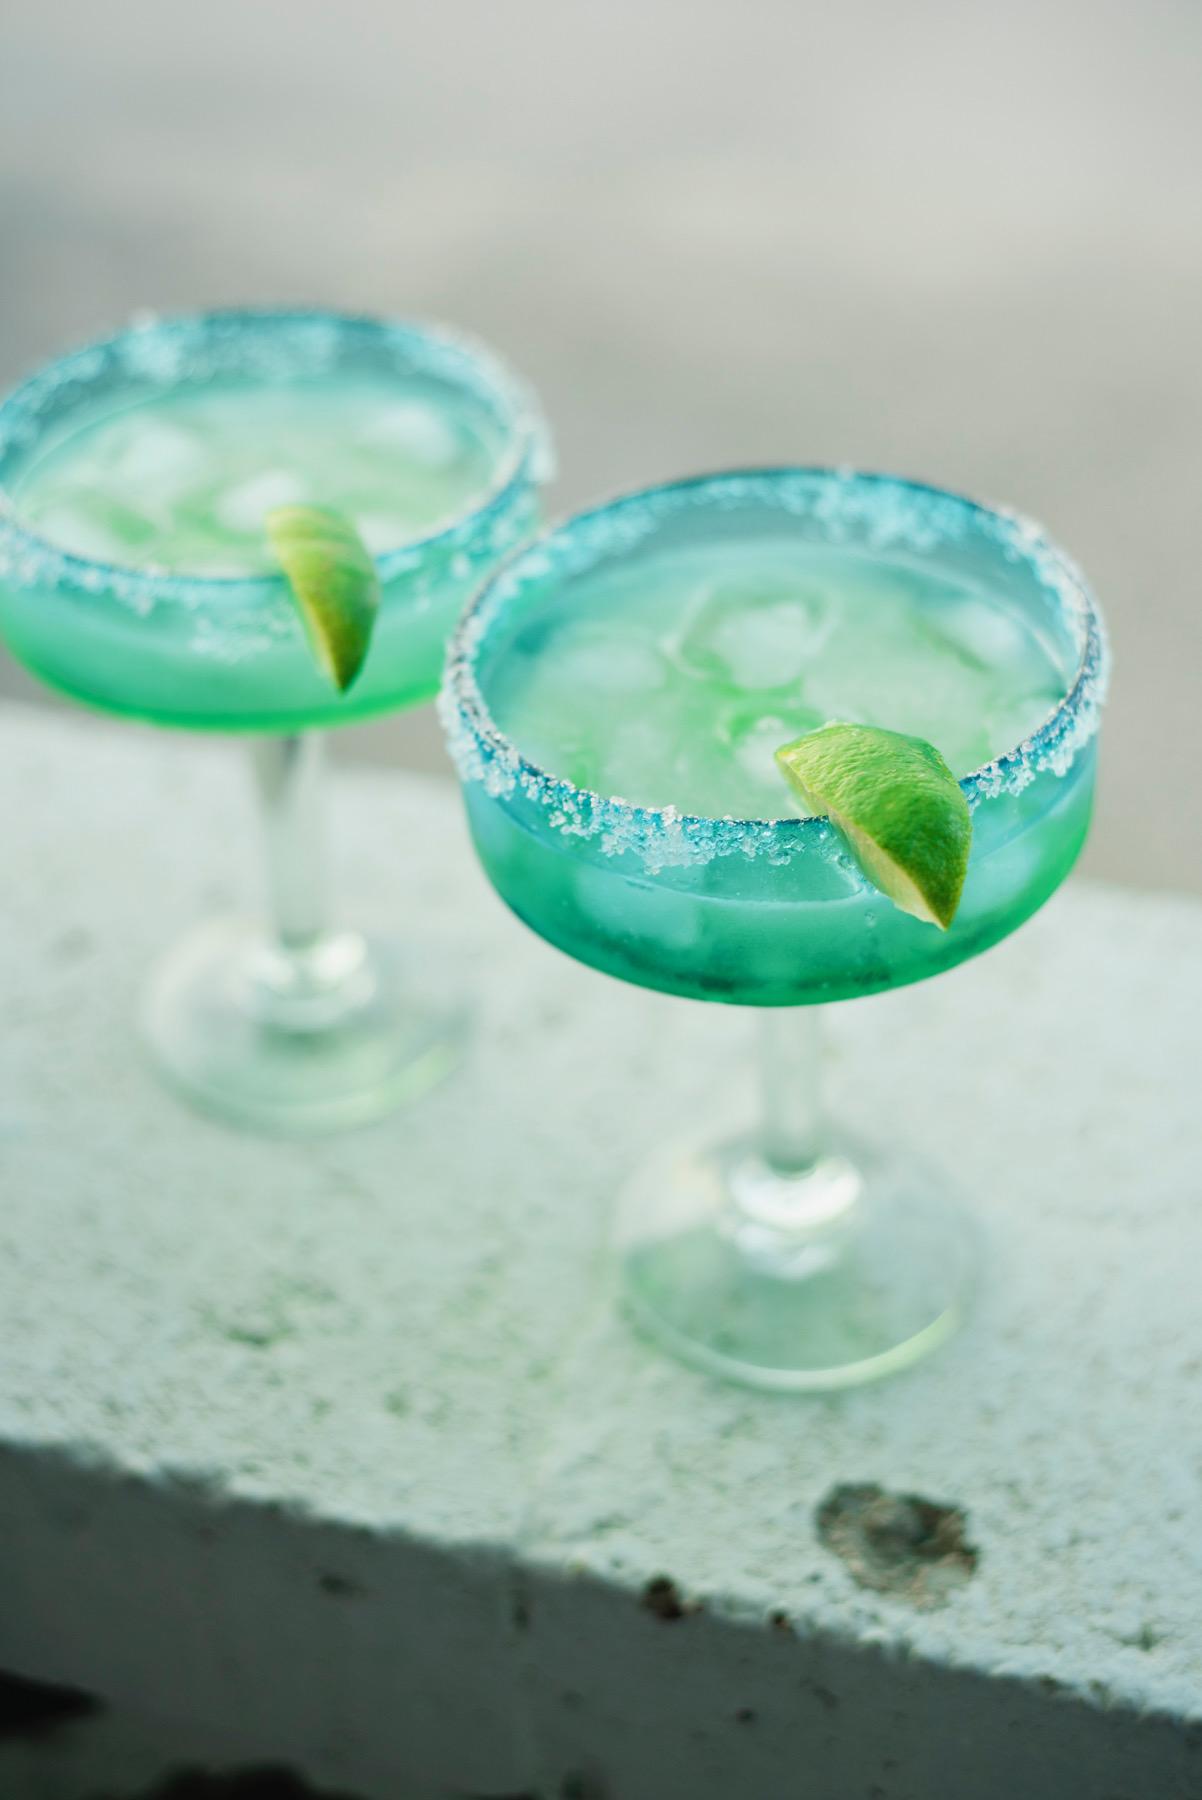 Ingredients: - 1 oz tequila½ oz triple sec2 oz aloe juiceJuice of ½-1 fresh limeCoarse sea salt